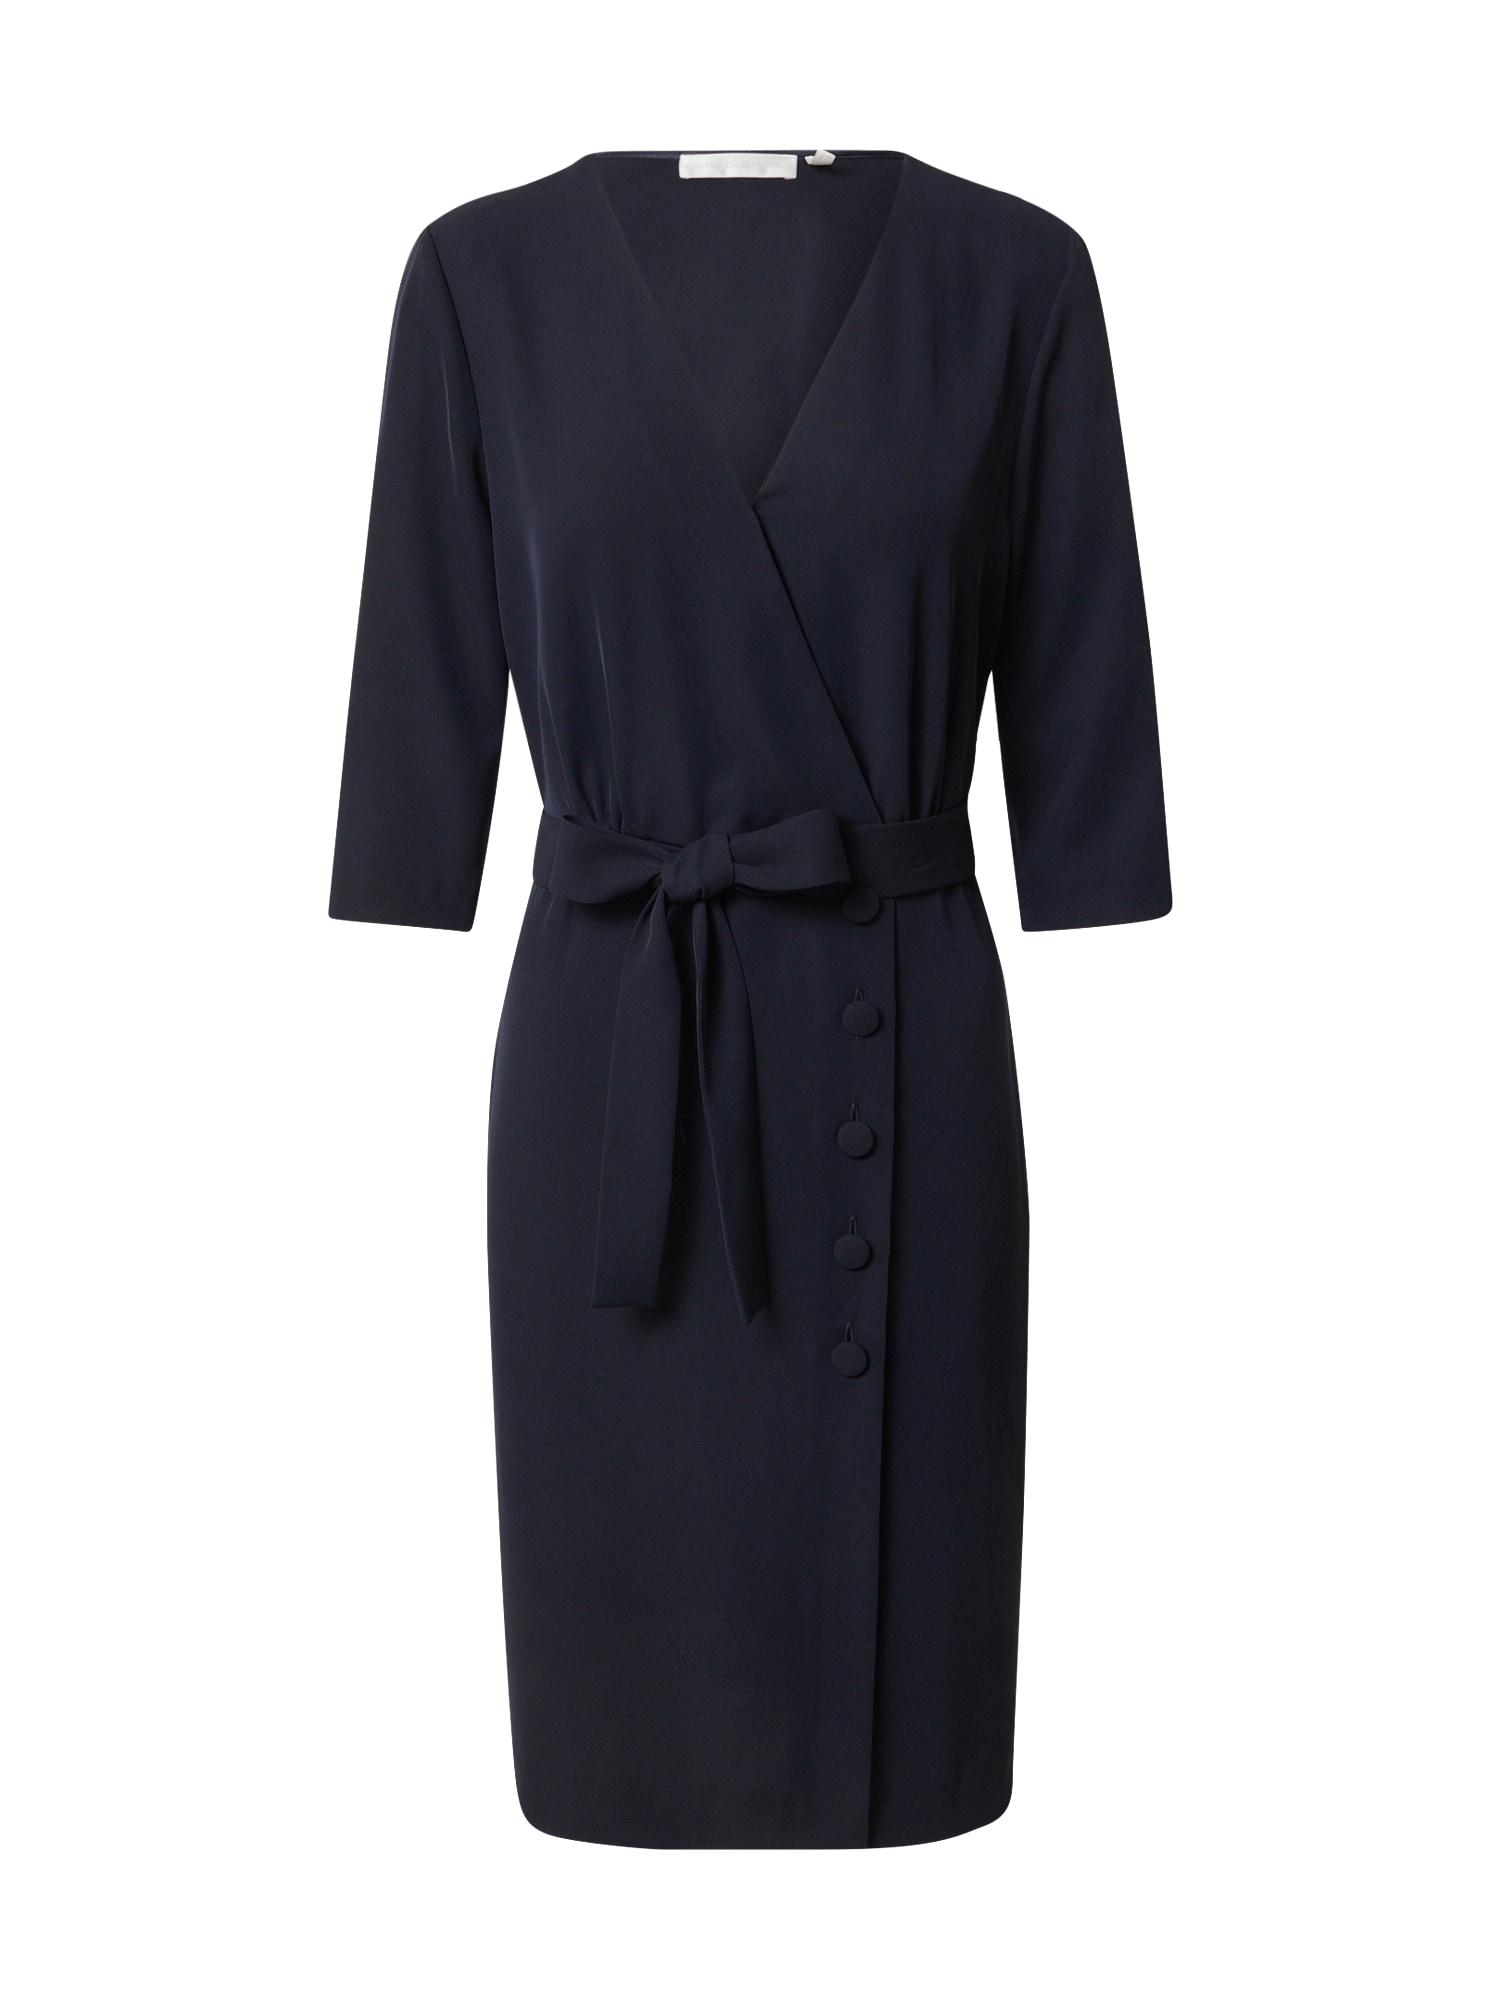 Guido Maria Kretschmer Collection Suknelė